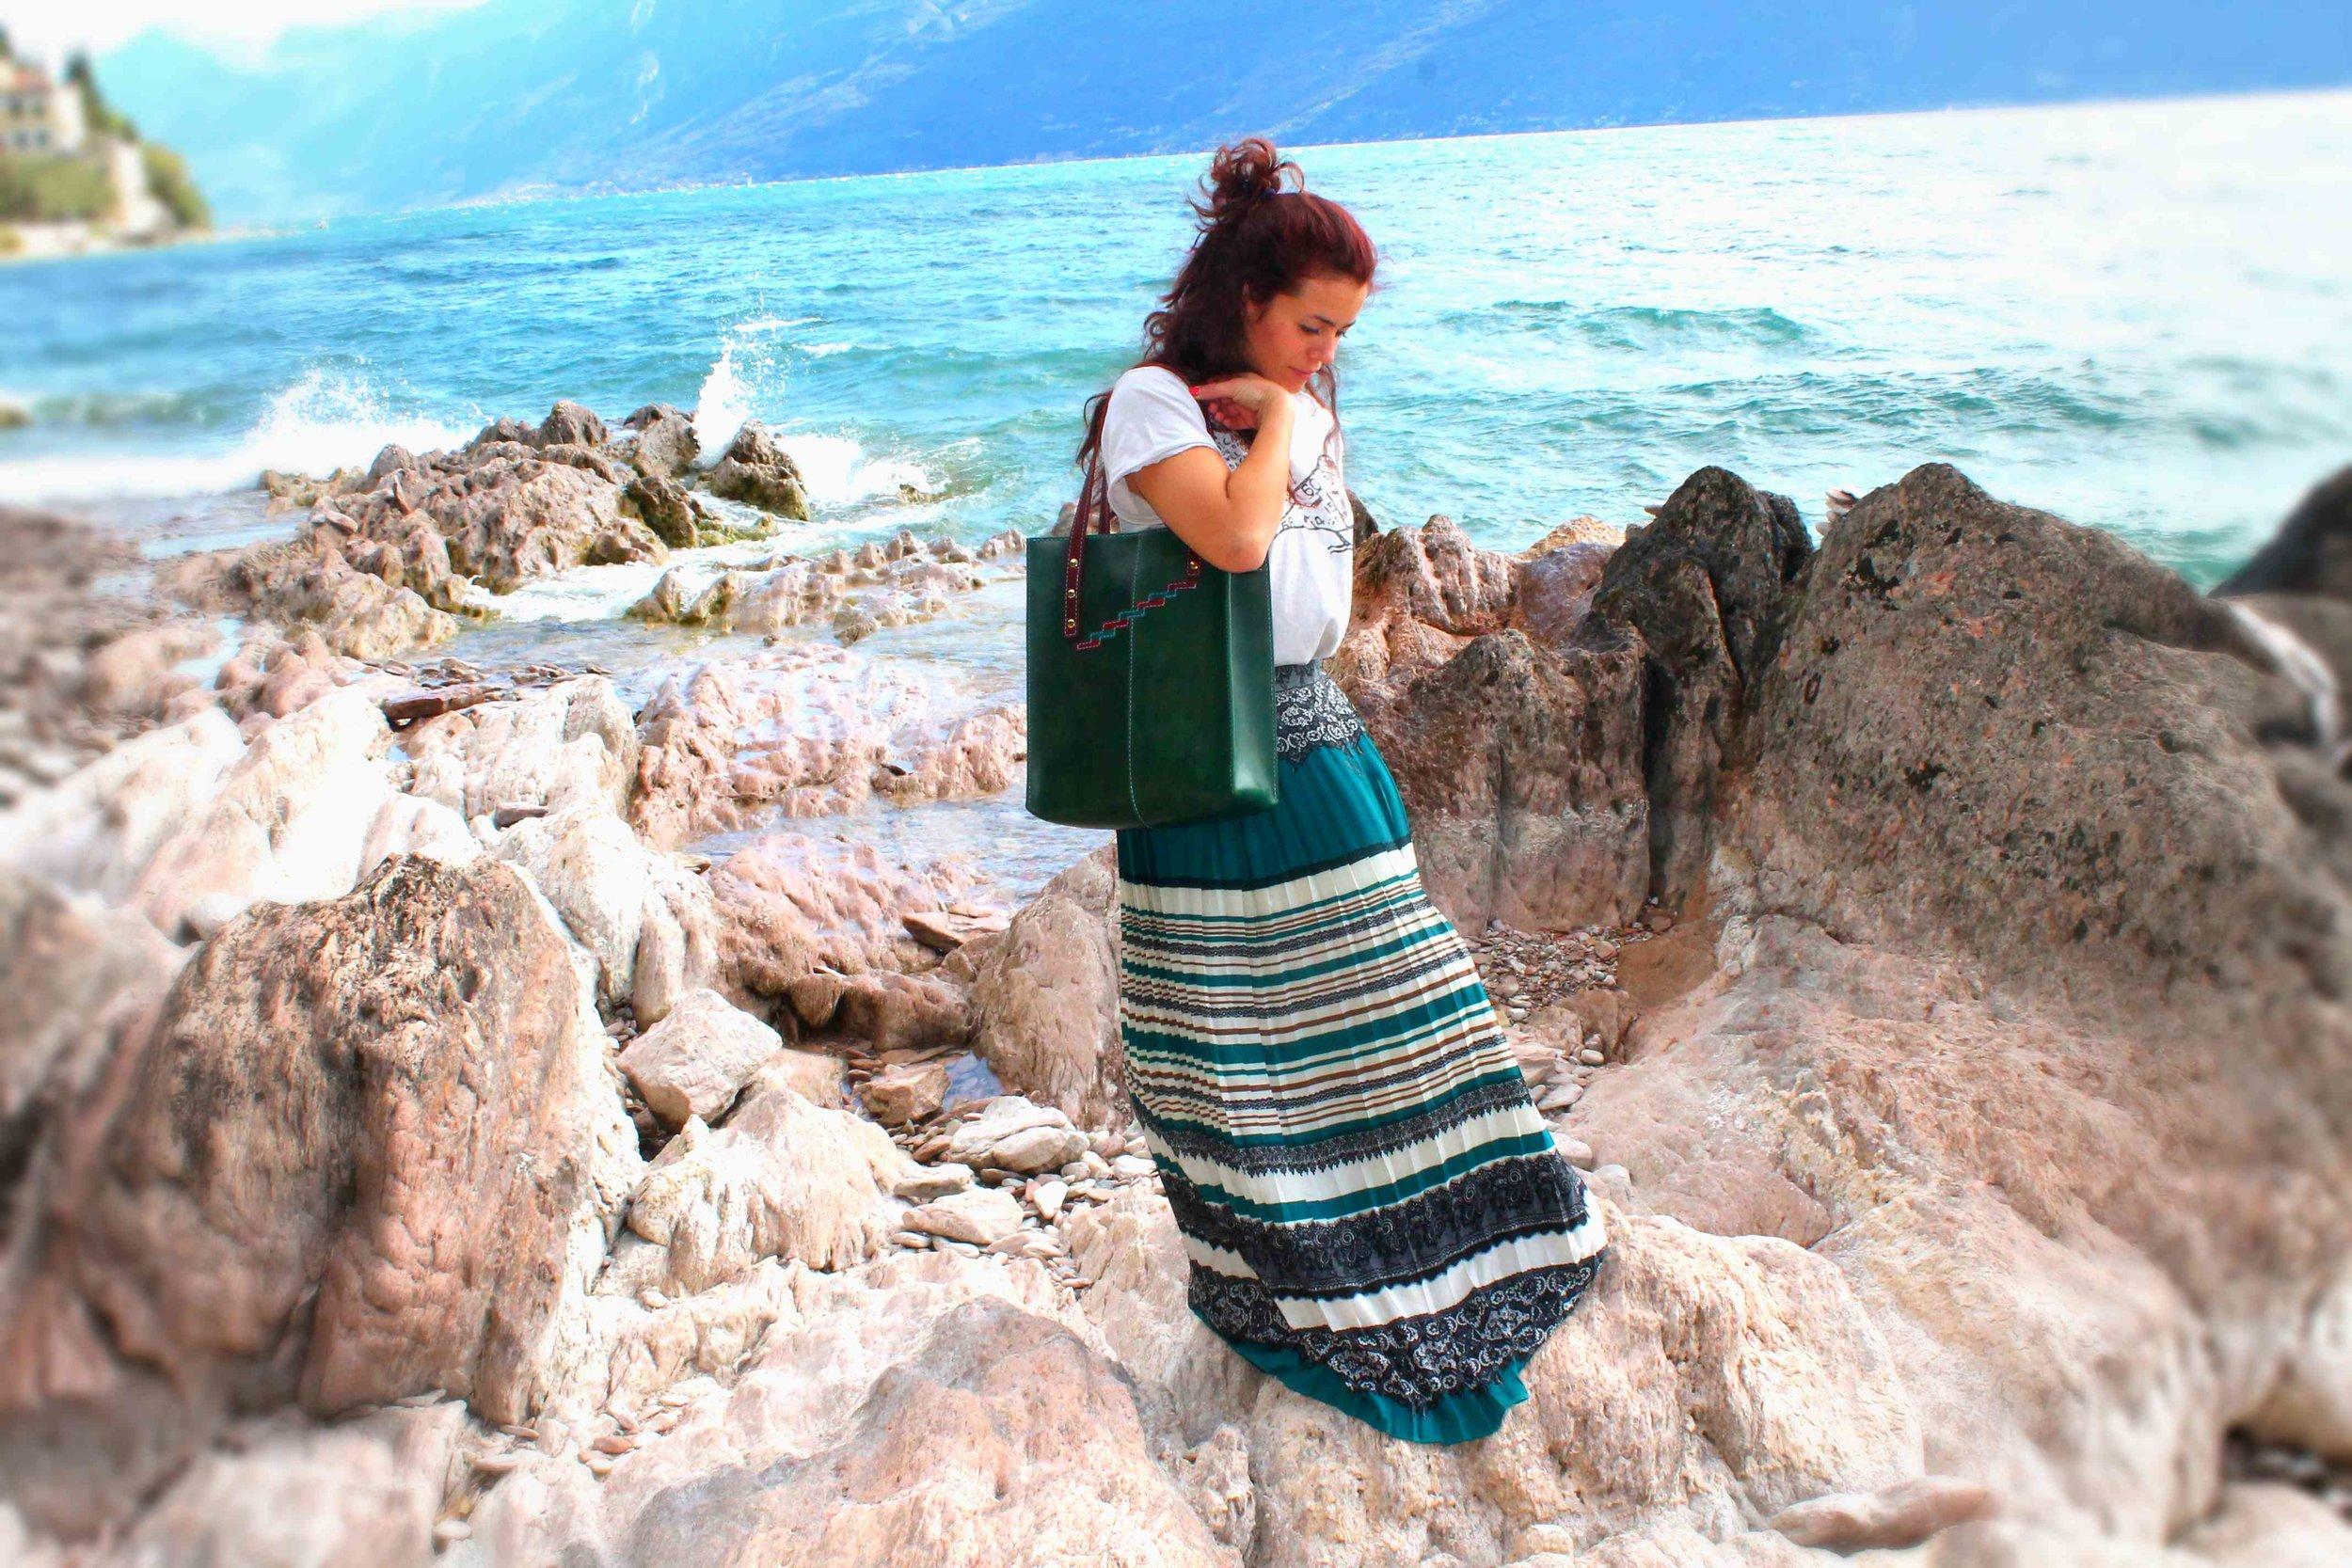 Summer #statusquoio #cuoio #lake #bag #wave.jpg